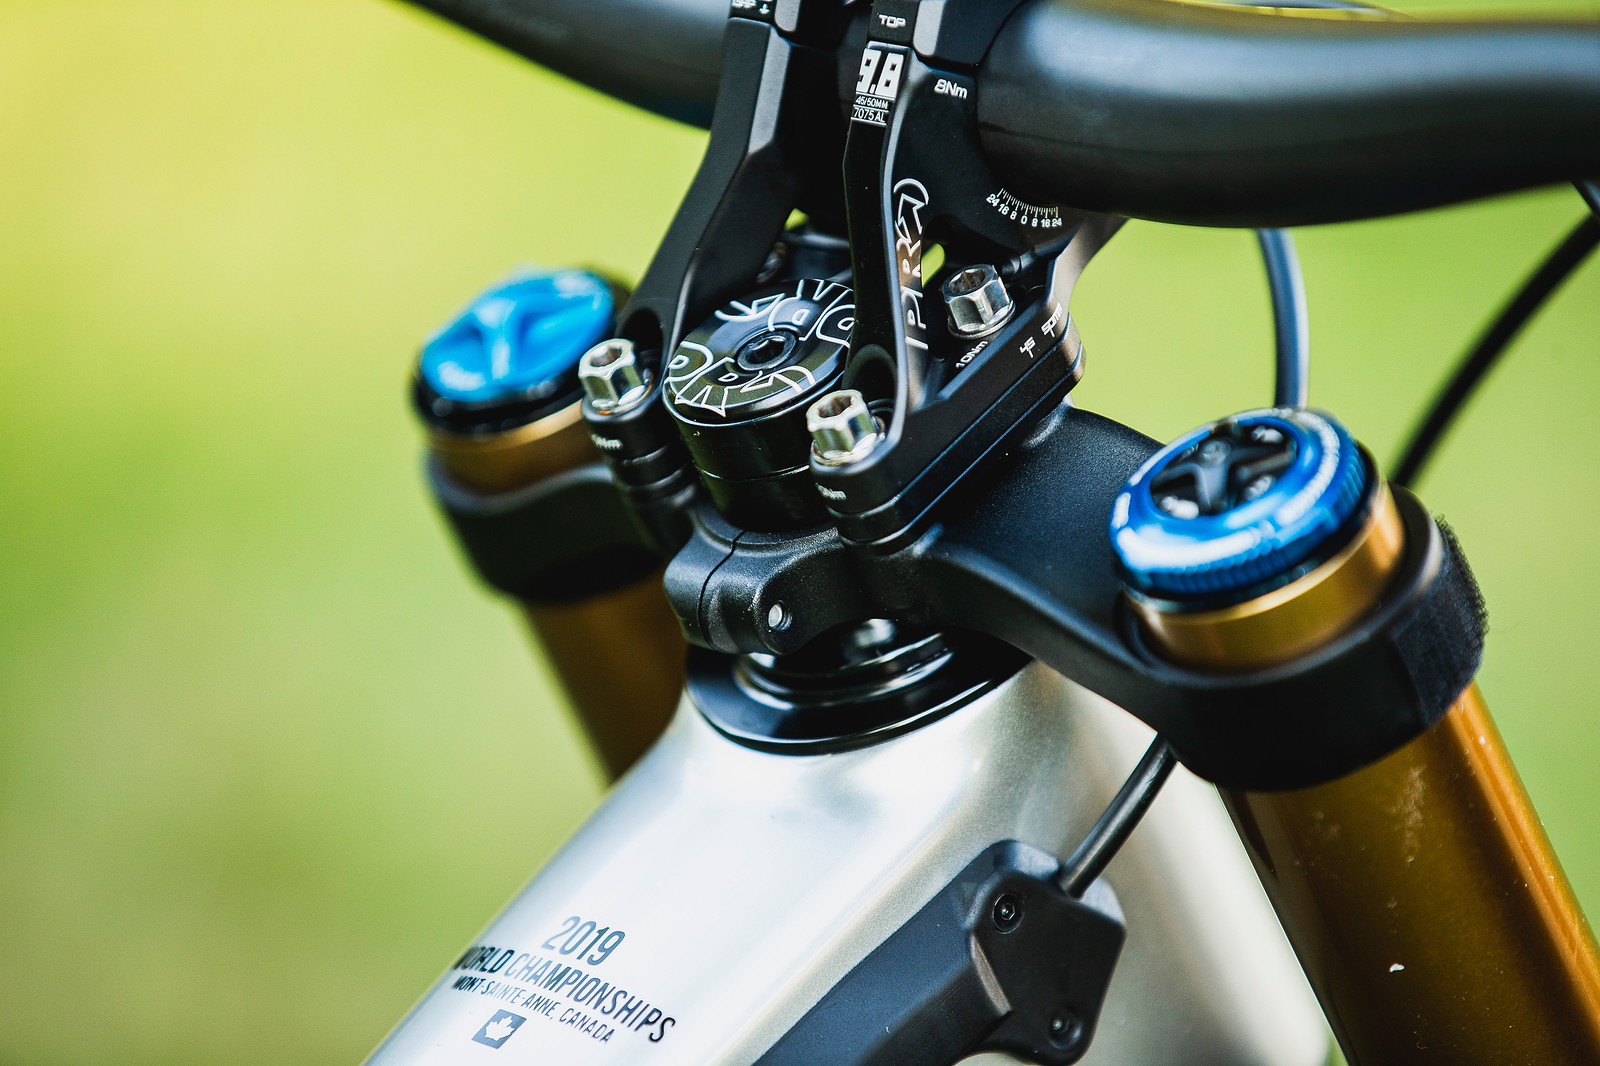 Danny Hart's Saracen Myst at 2019 Worlds MSA - Danny Hart's Saracen Myst at 2019 Worlds MSA - Mountain Biking Pictures - Vital MTB